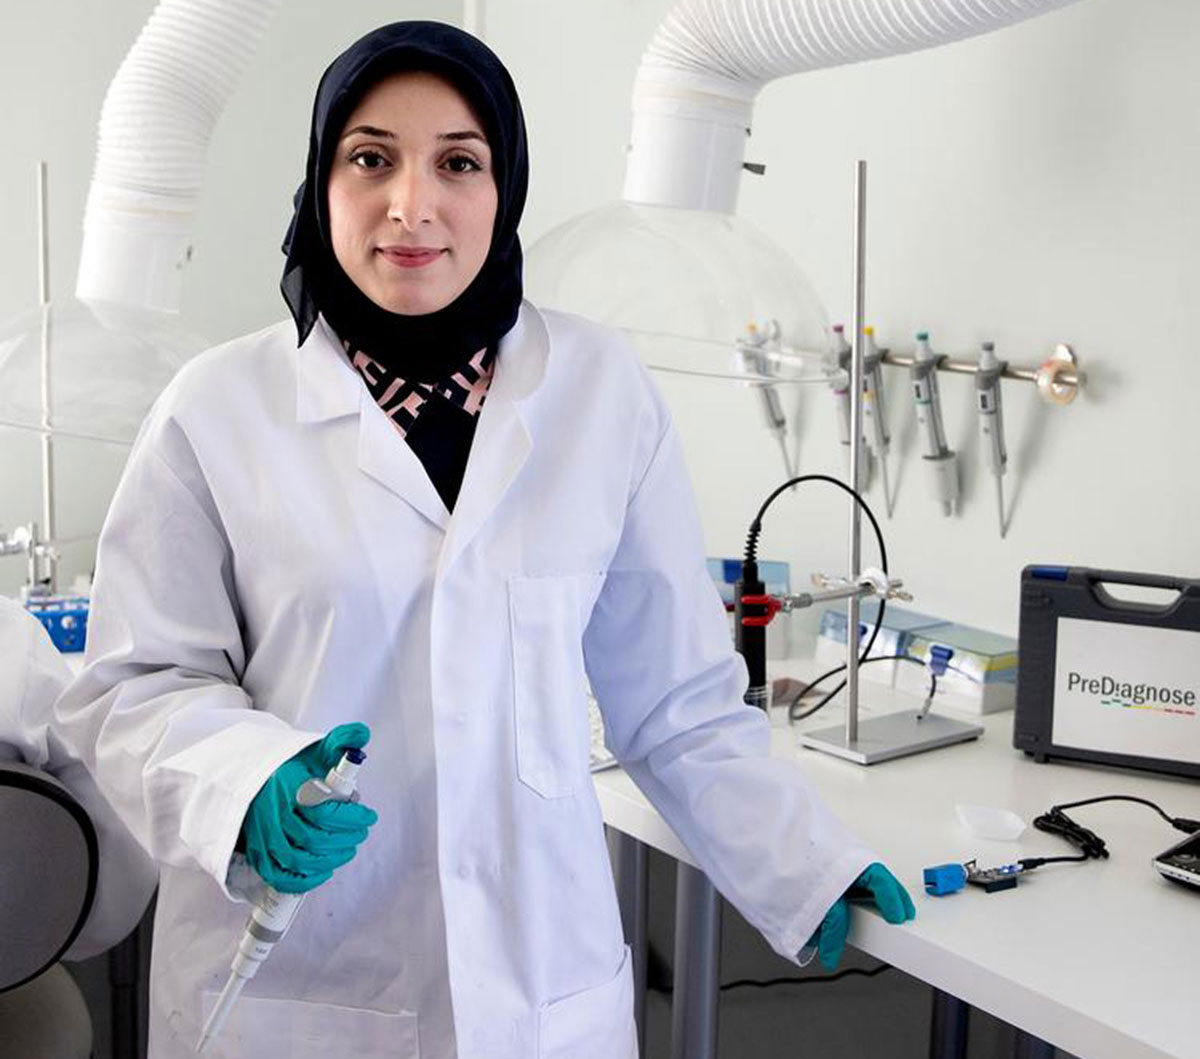 Фатима Аз-Захра Аль-Атракт – гениальный нанотехнолог